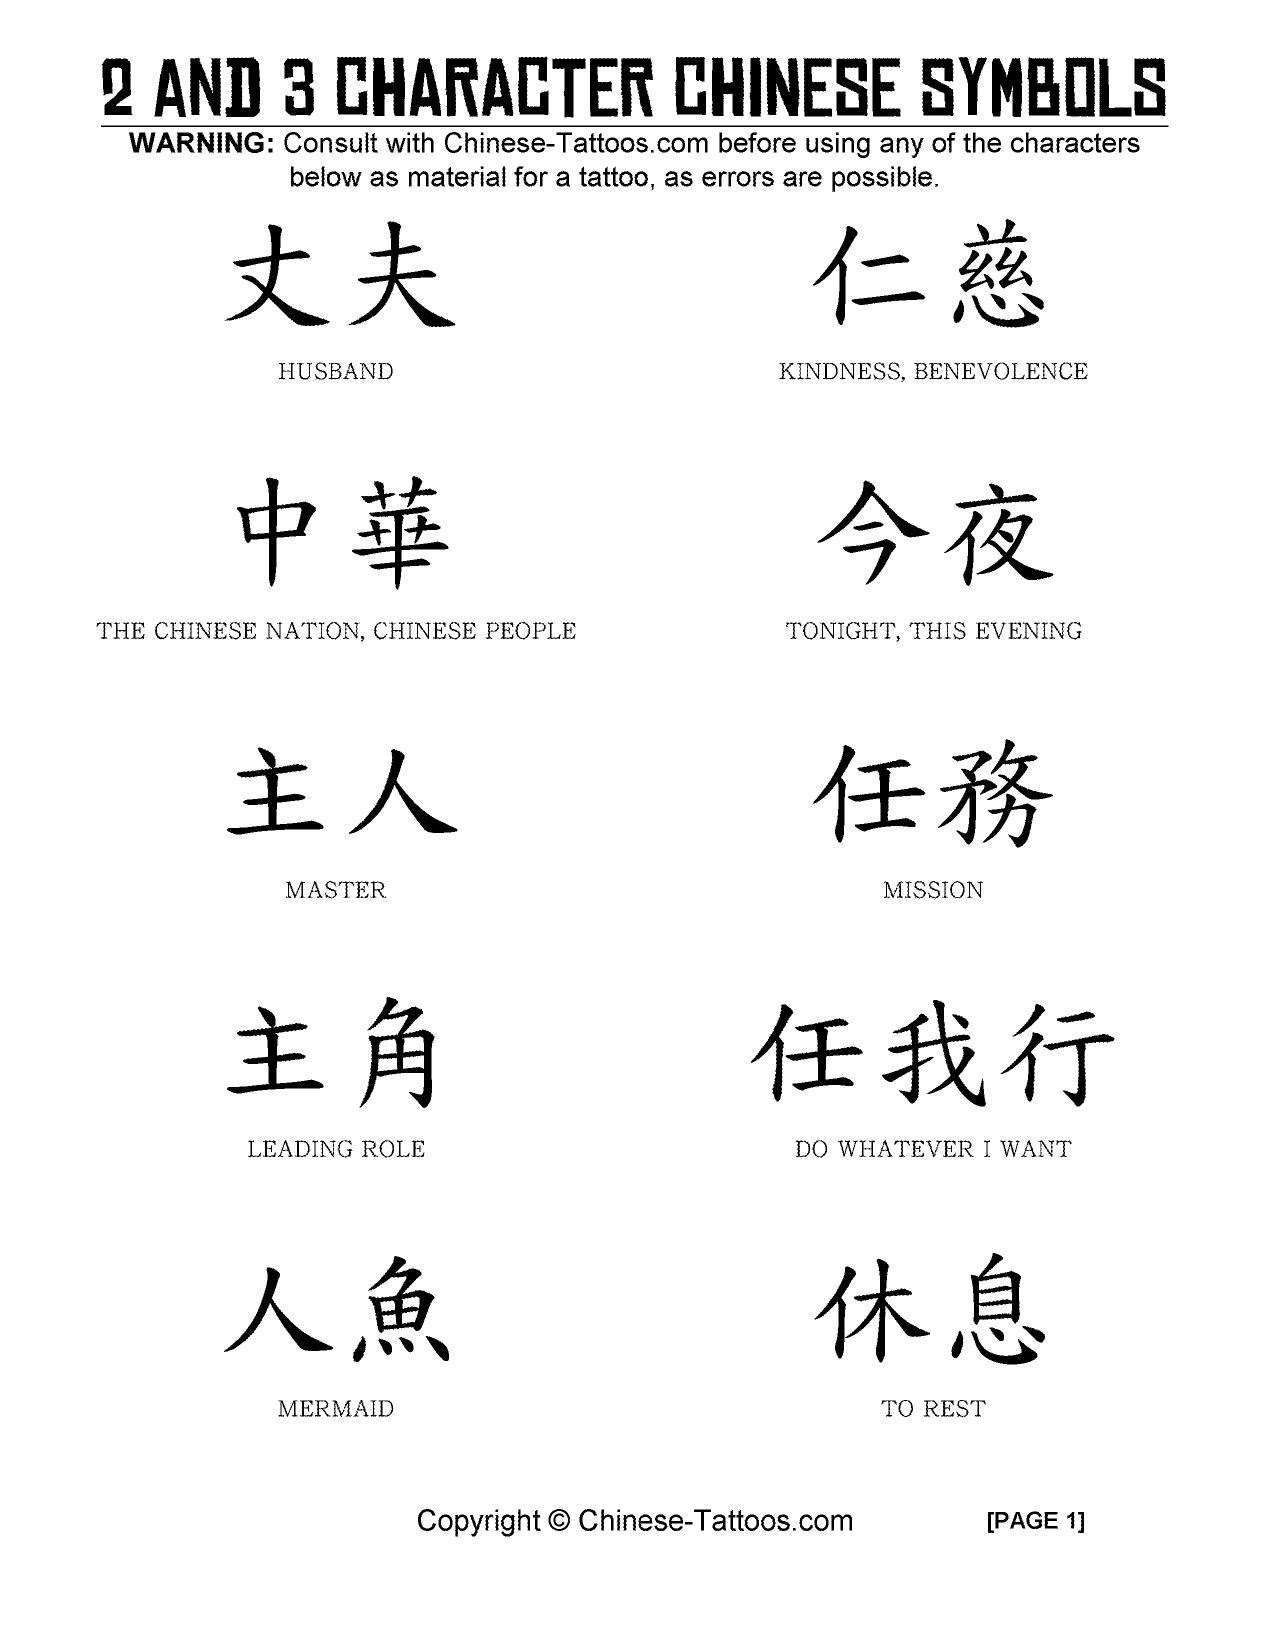 Chinese Character Tattoos : chinese, character, tattoos, Chinese, Tattoos, Characters, Chinese-Tattoos.com, Issuu